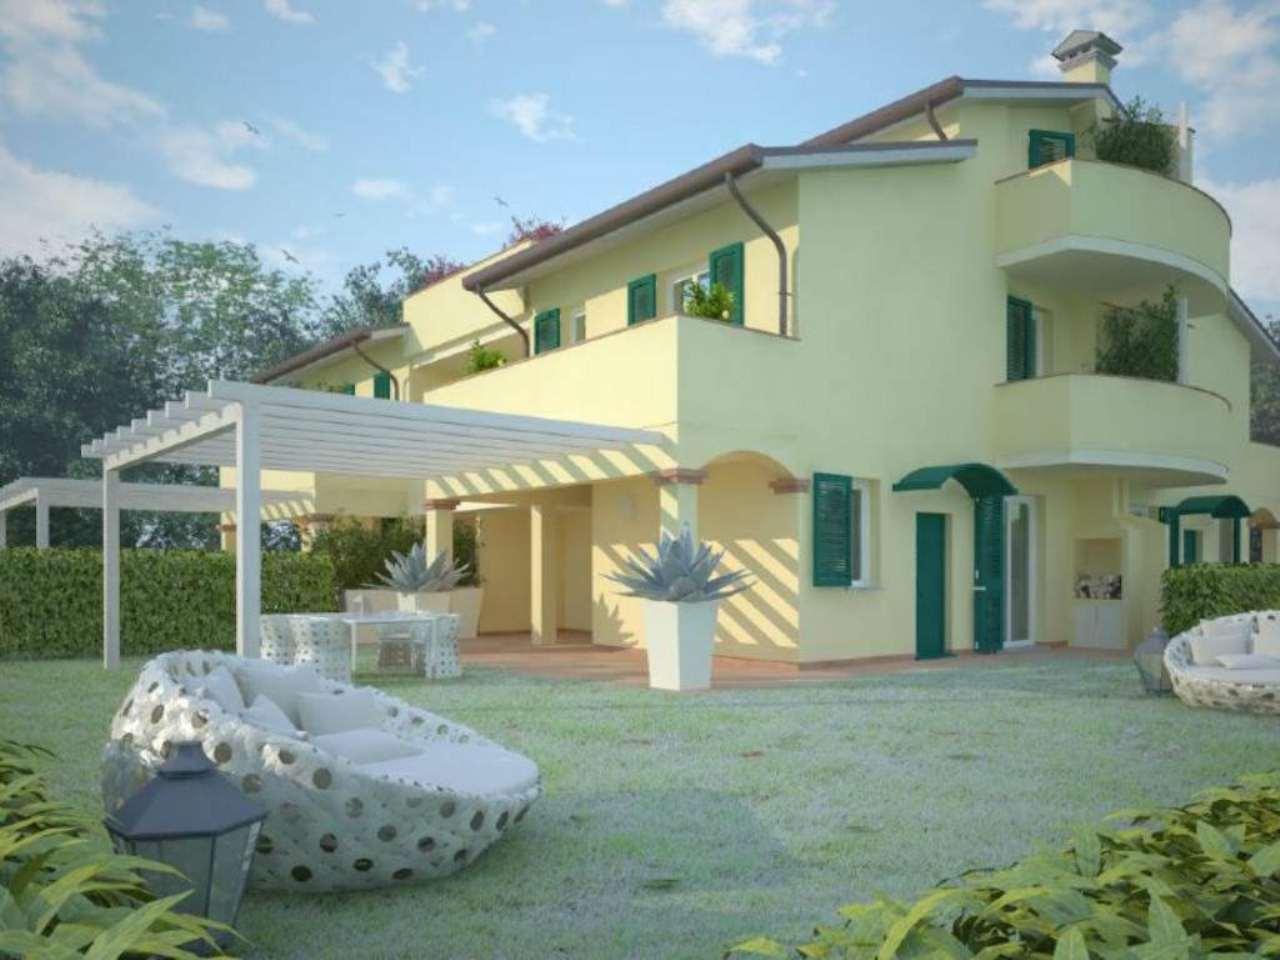 Villa in Vendita a Russi: 3 locali, 100 mq